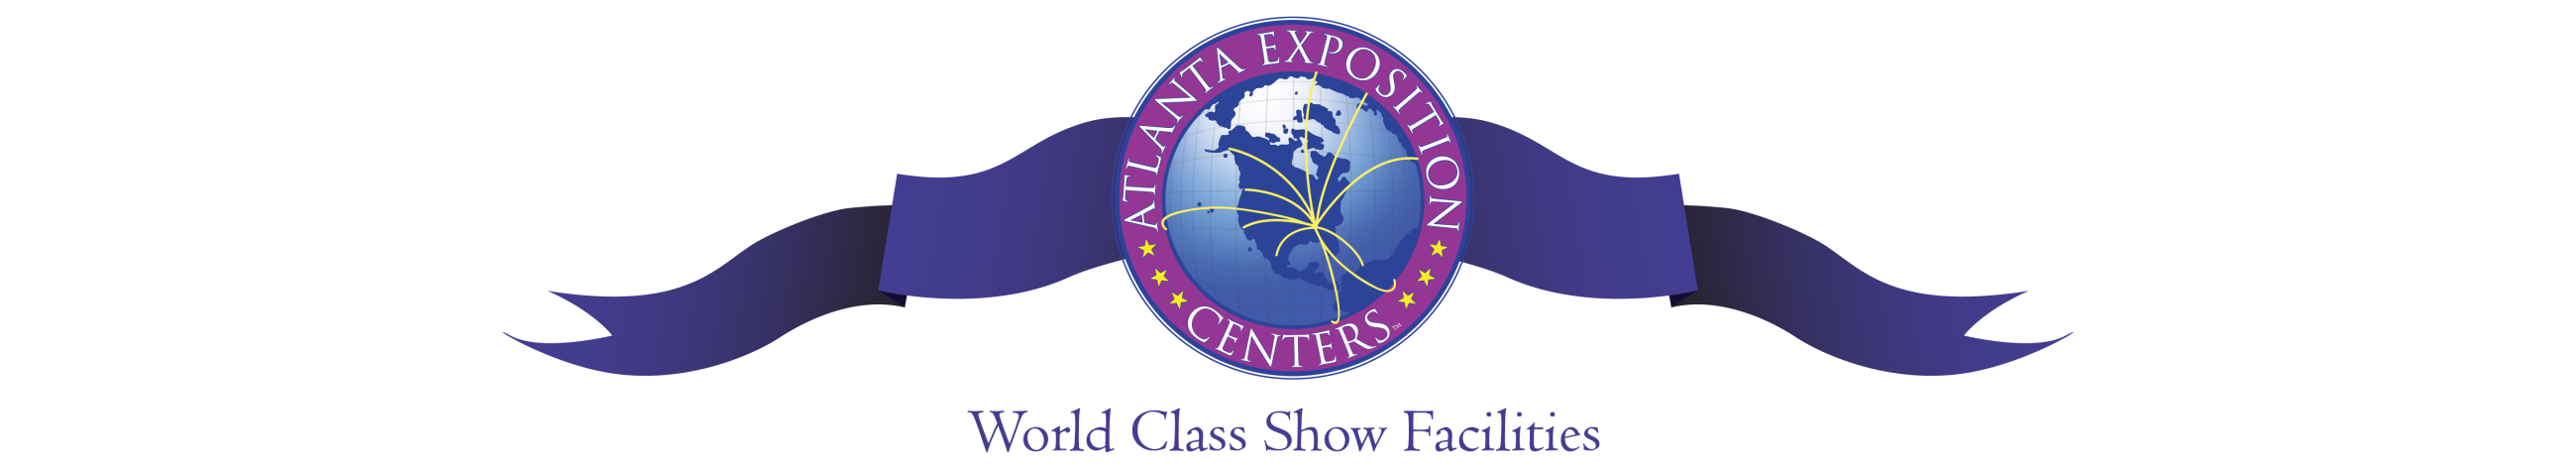 Atlanta Expo Centers - Home